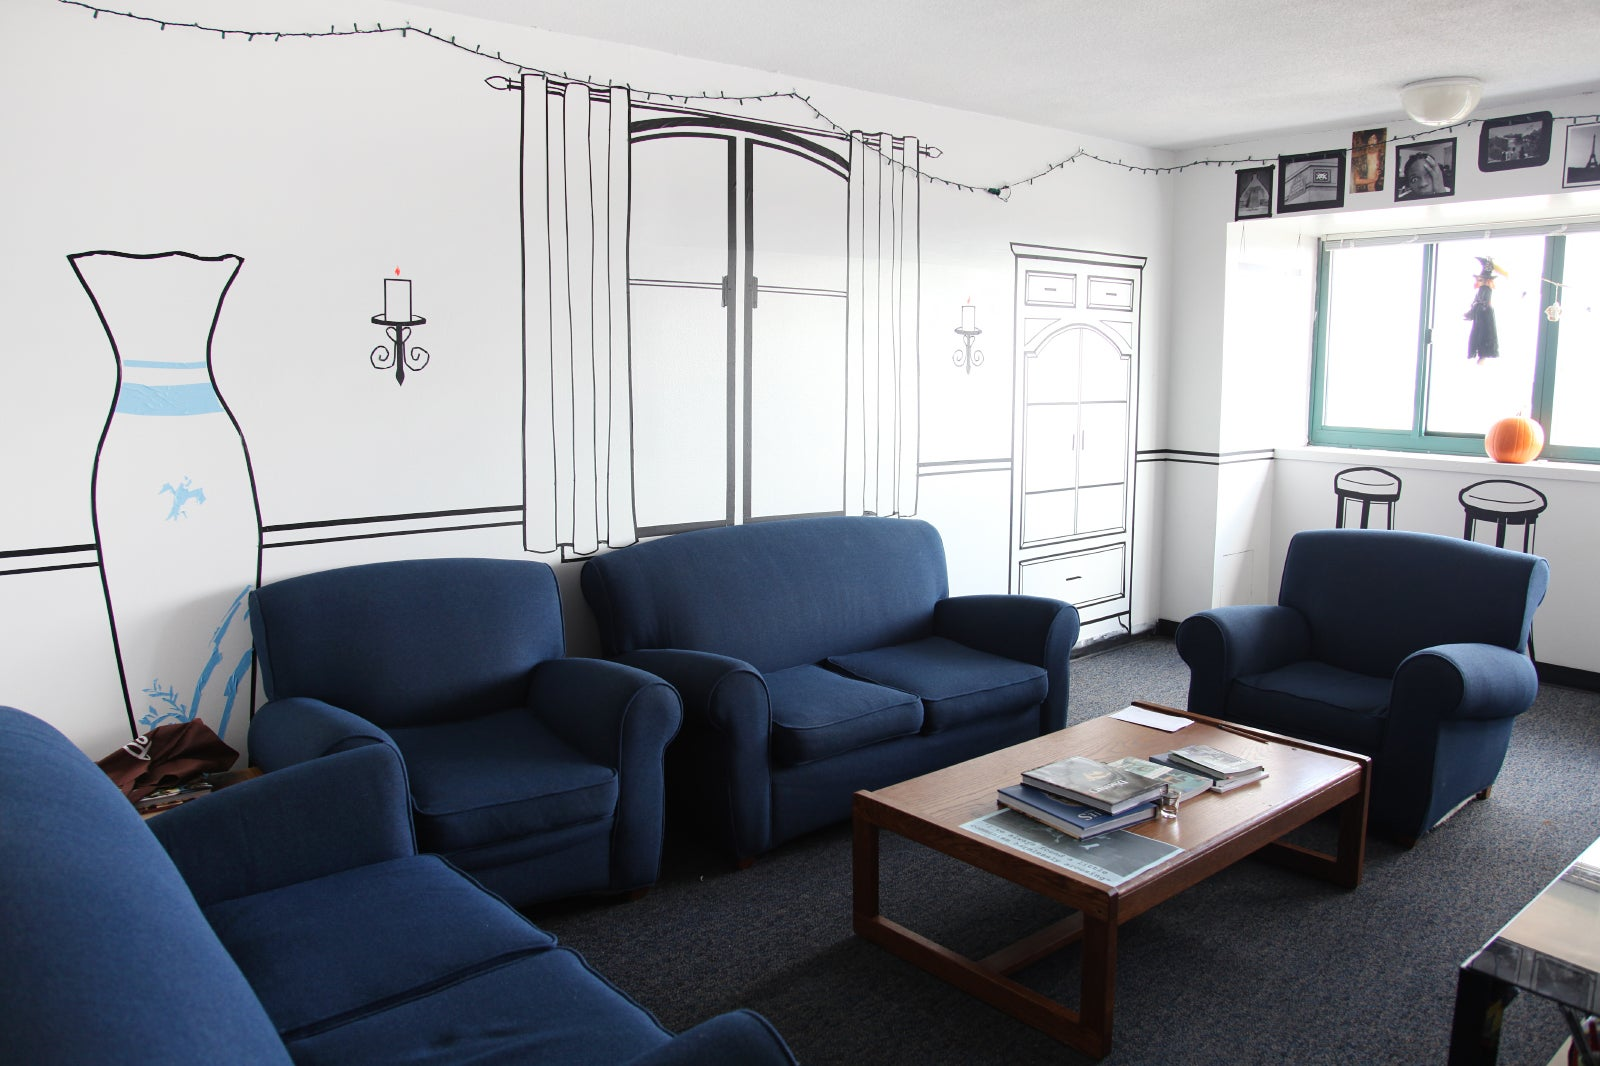 Fullsize Of College Dorm Room Decor